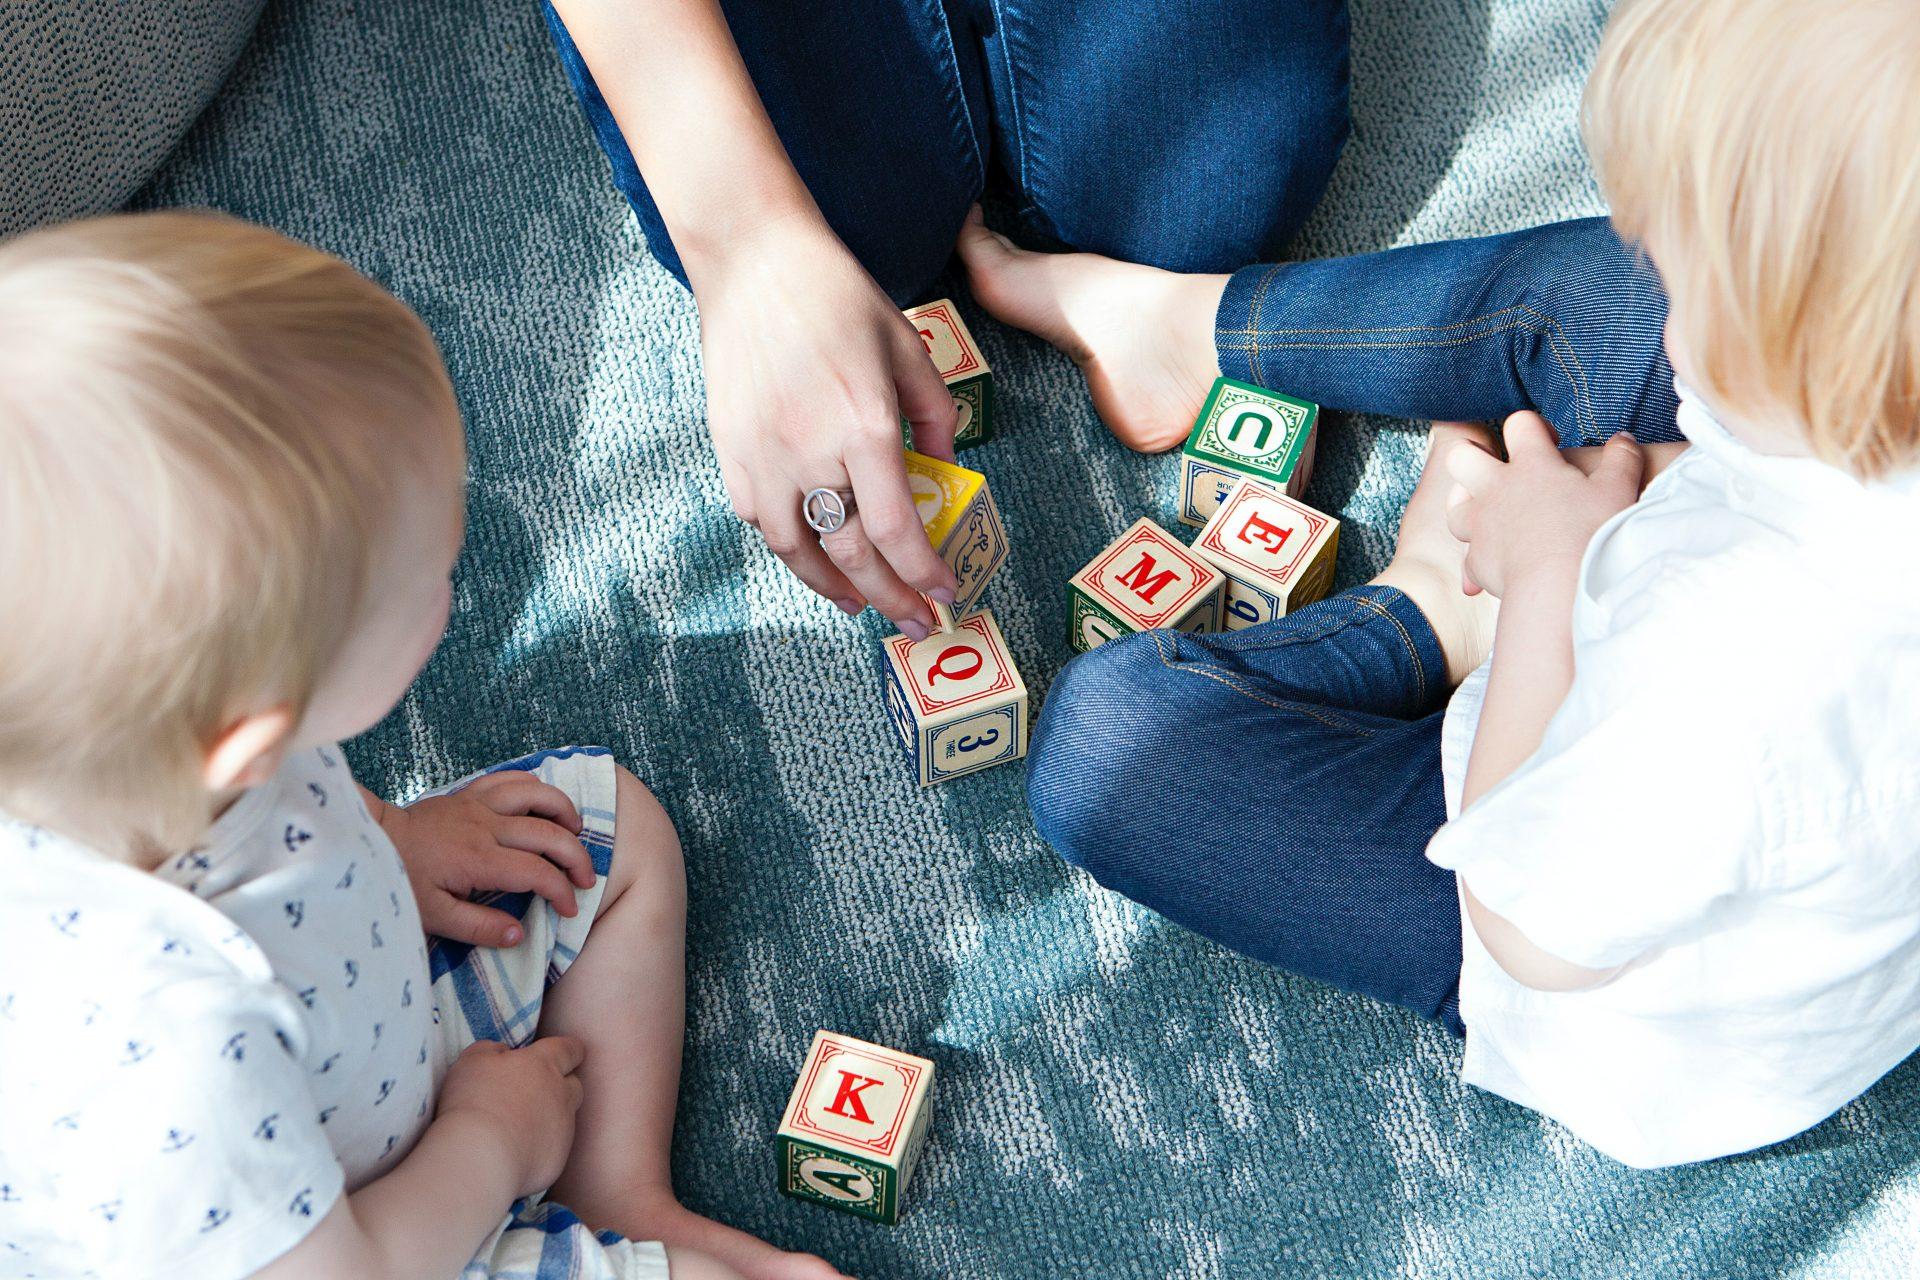 June 21: Child Tax Credit Awareness Day